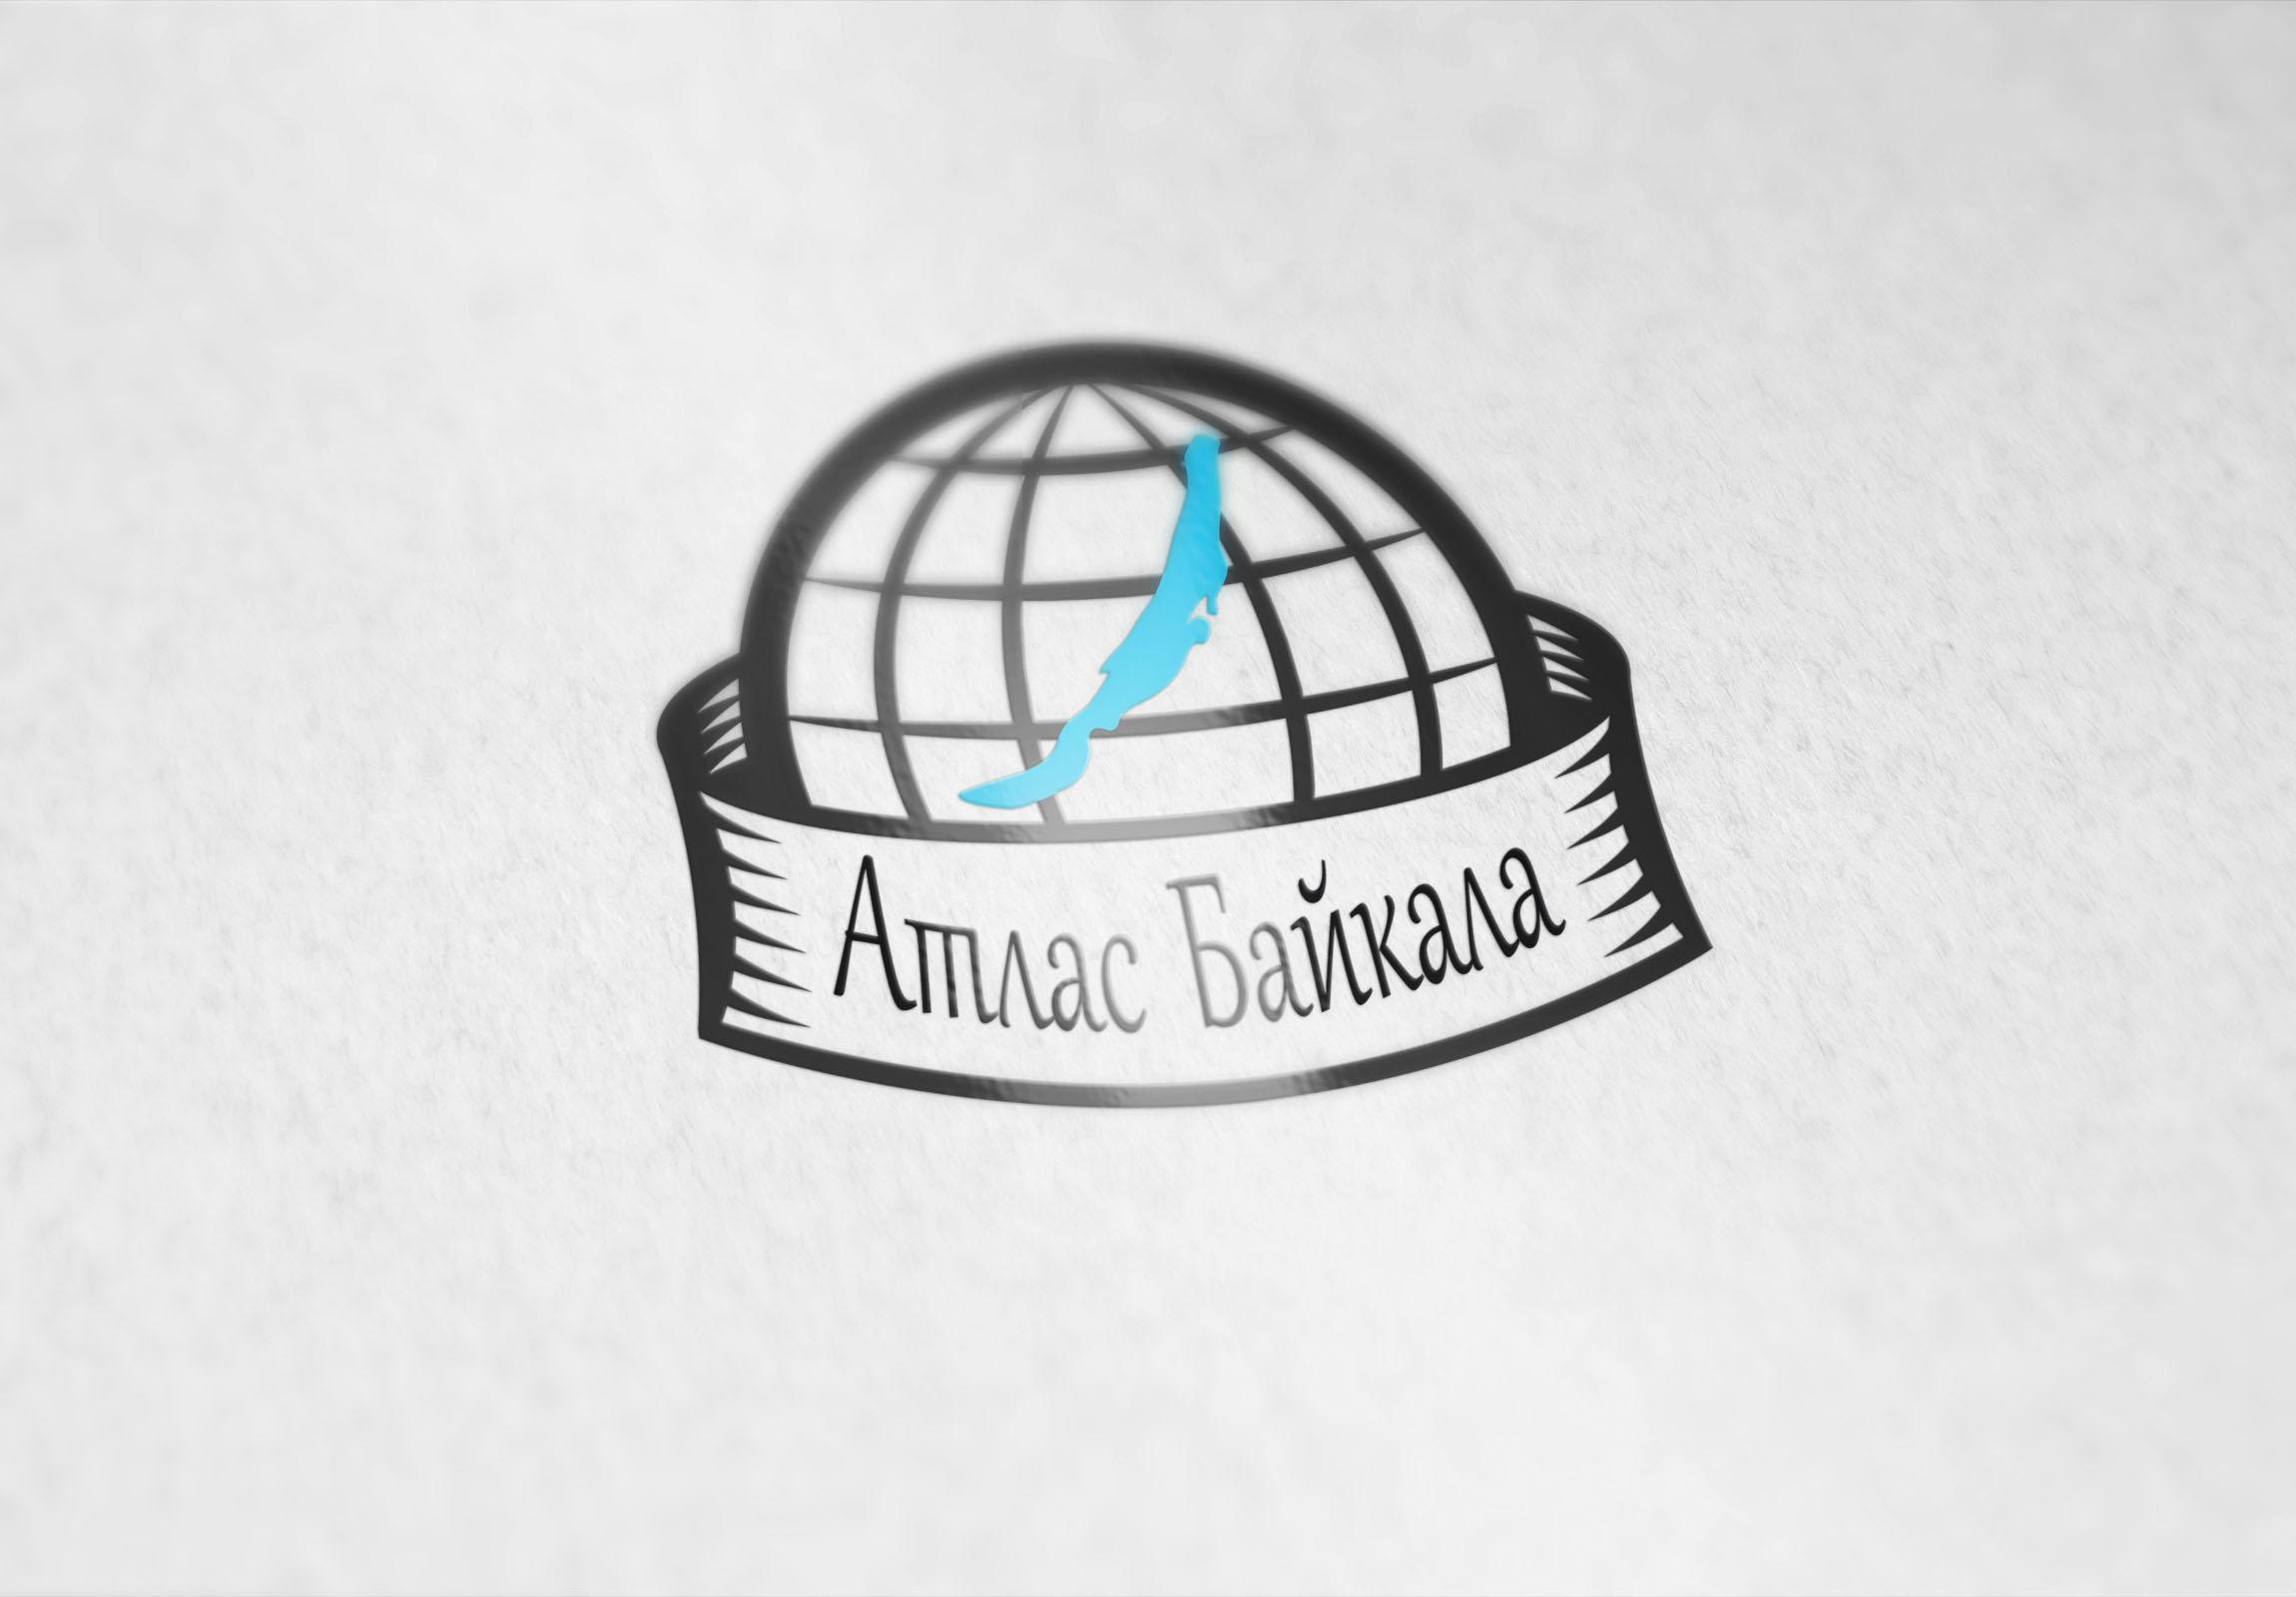 Разработка логотипа Атлас Байкала фото f_1635b07ebe5159f6.jpg